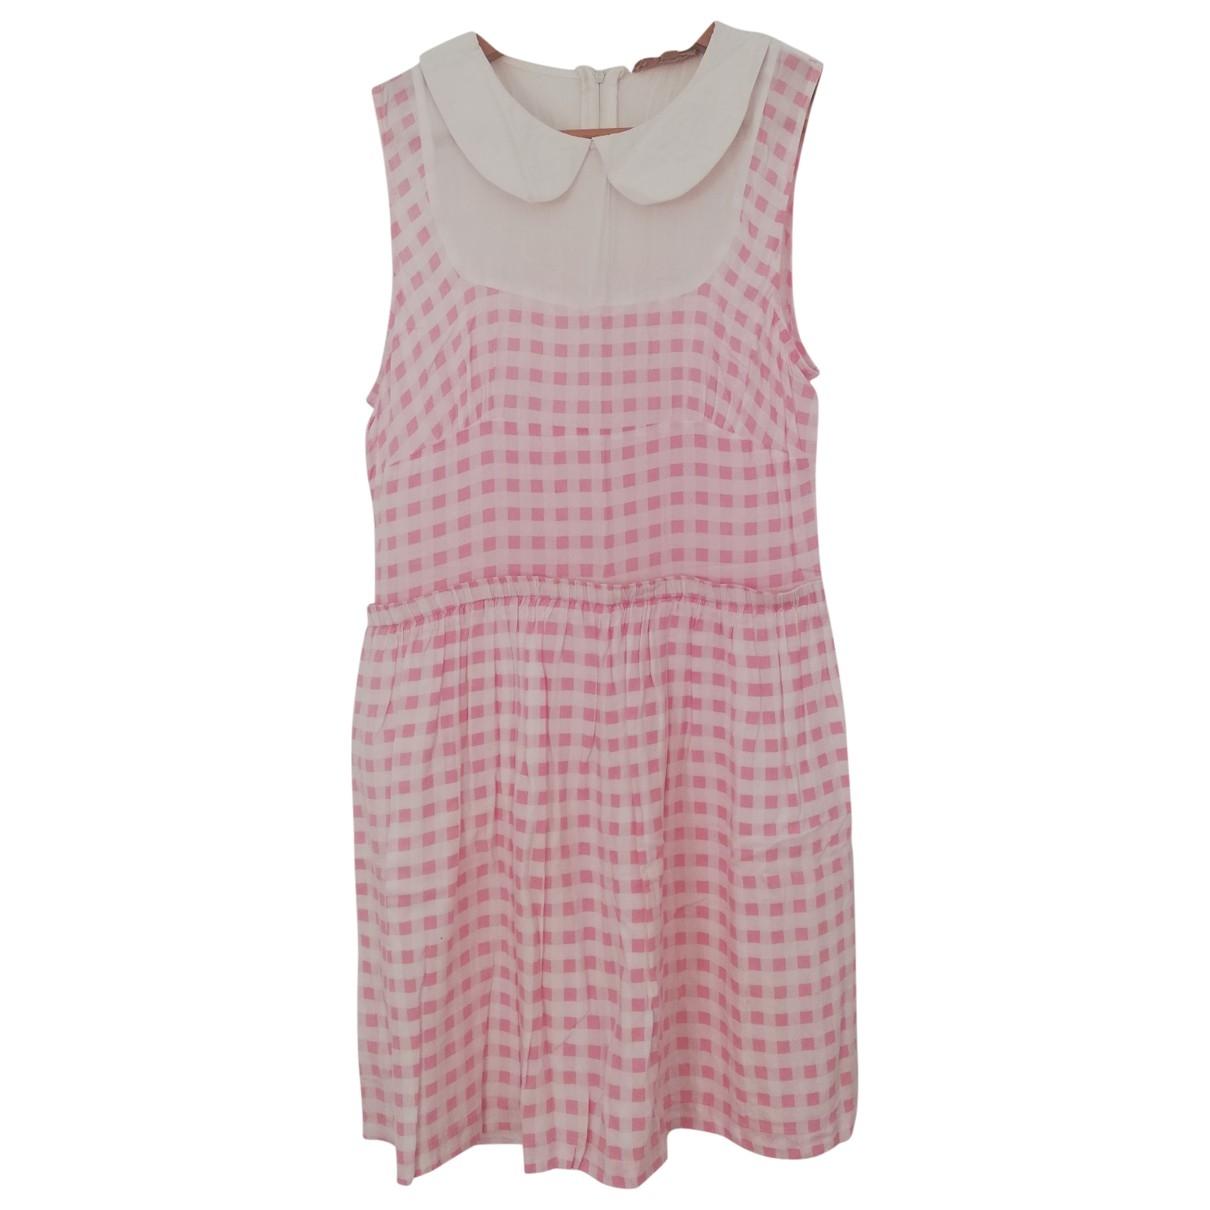 Bel Air \N Pink Cotton dress for Women 36 FR